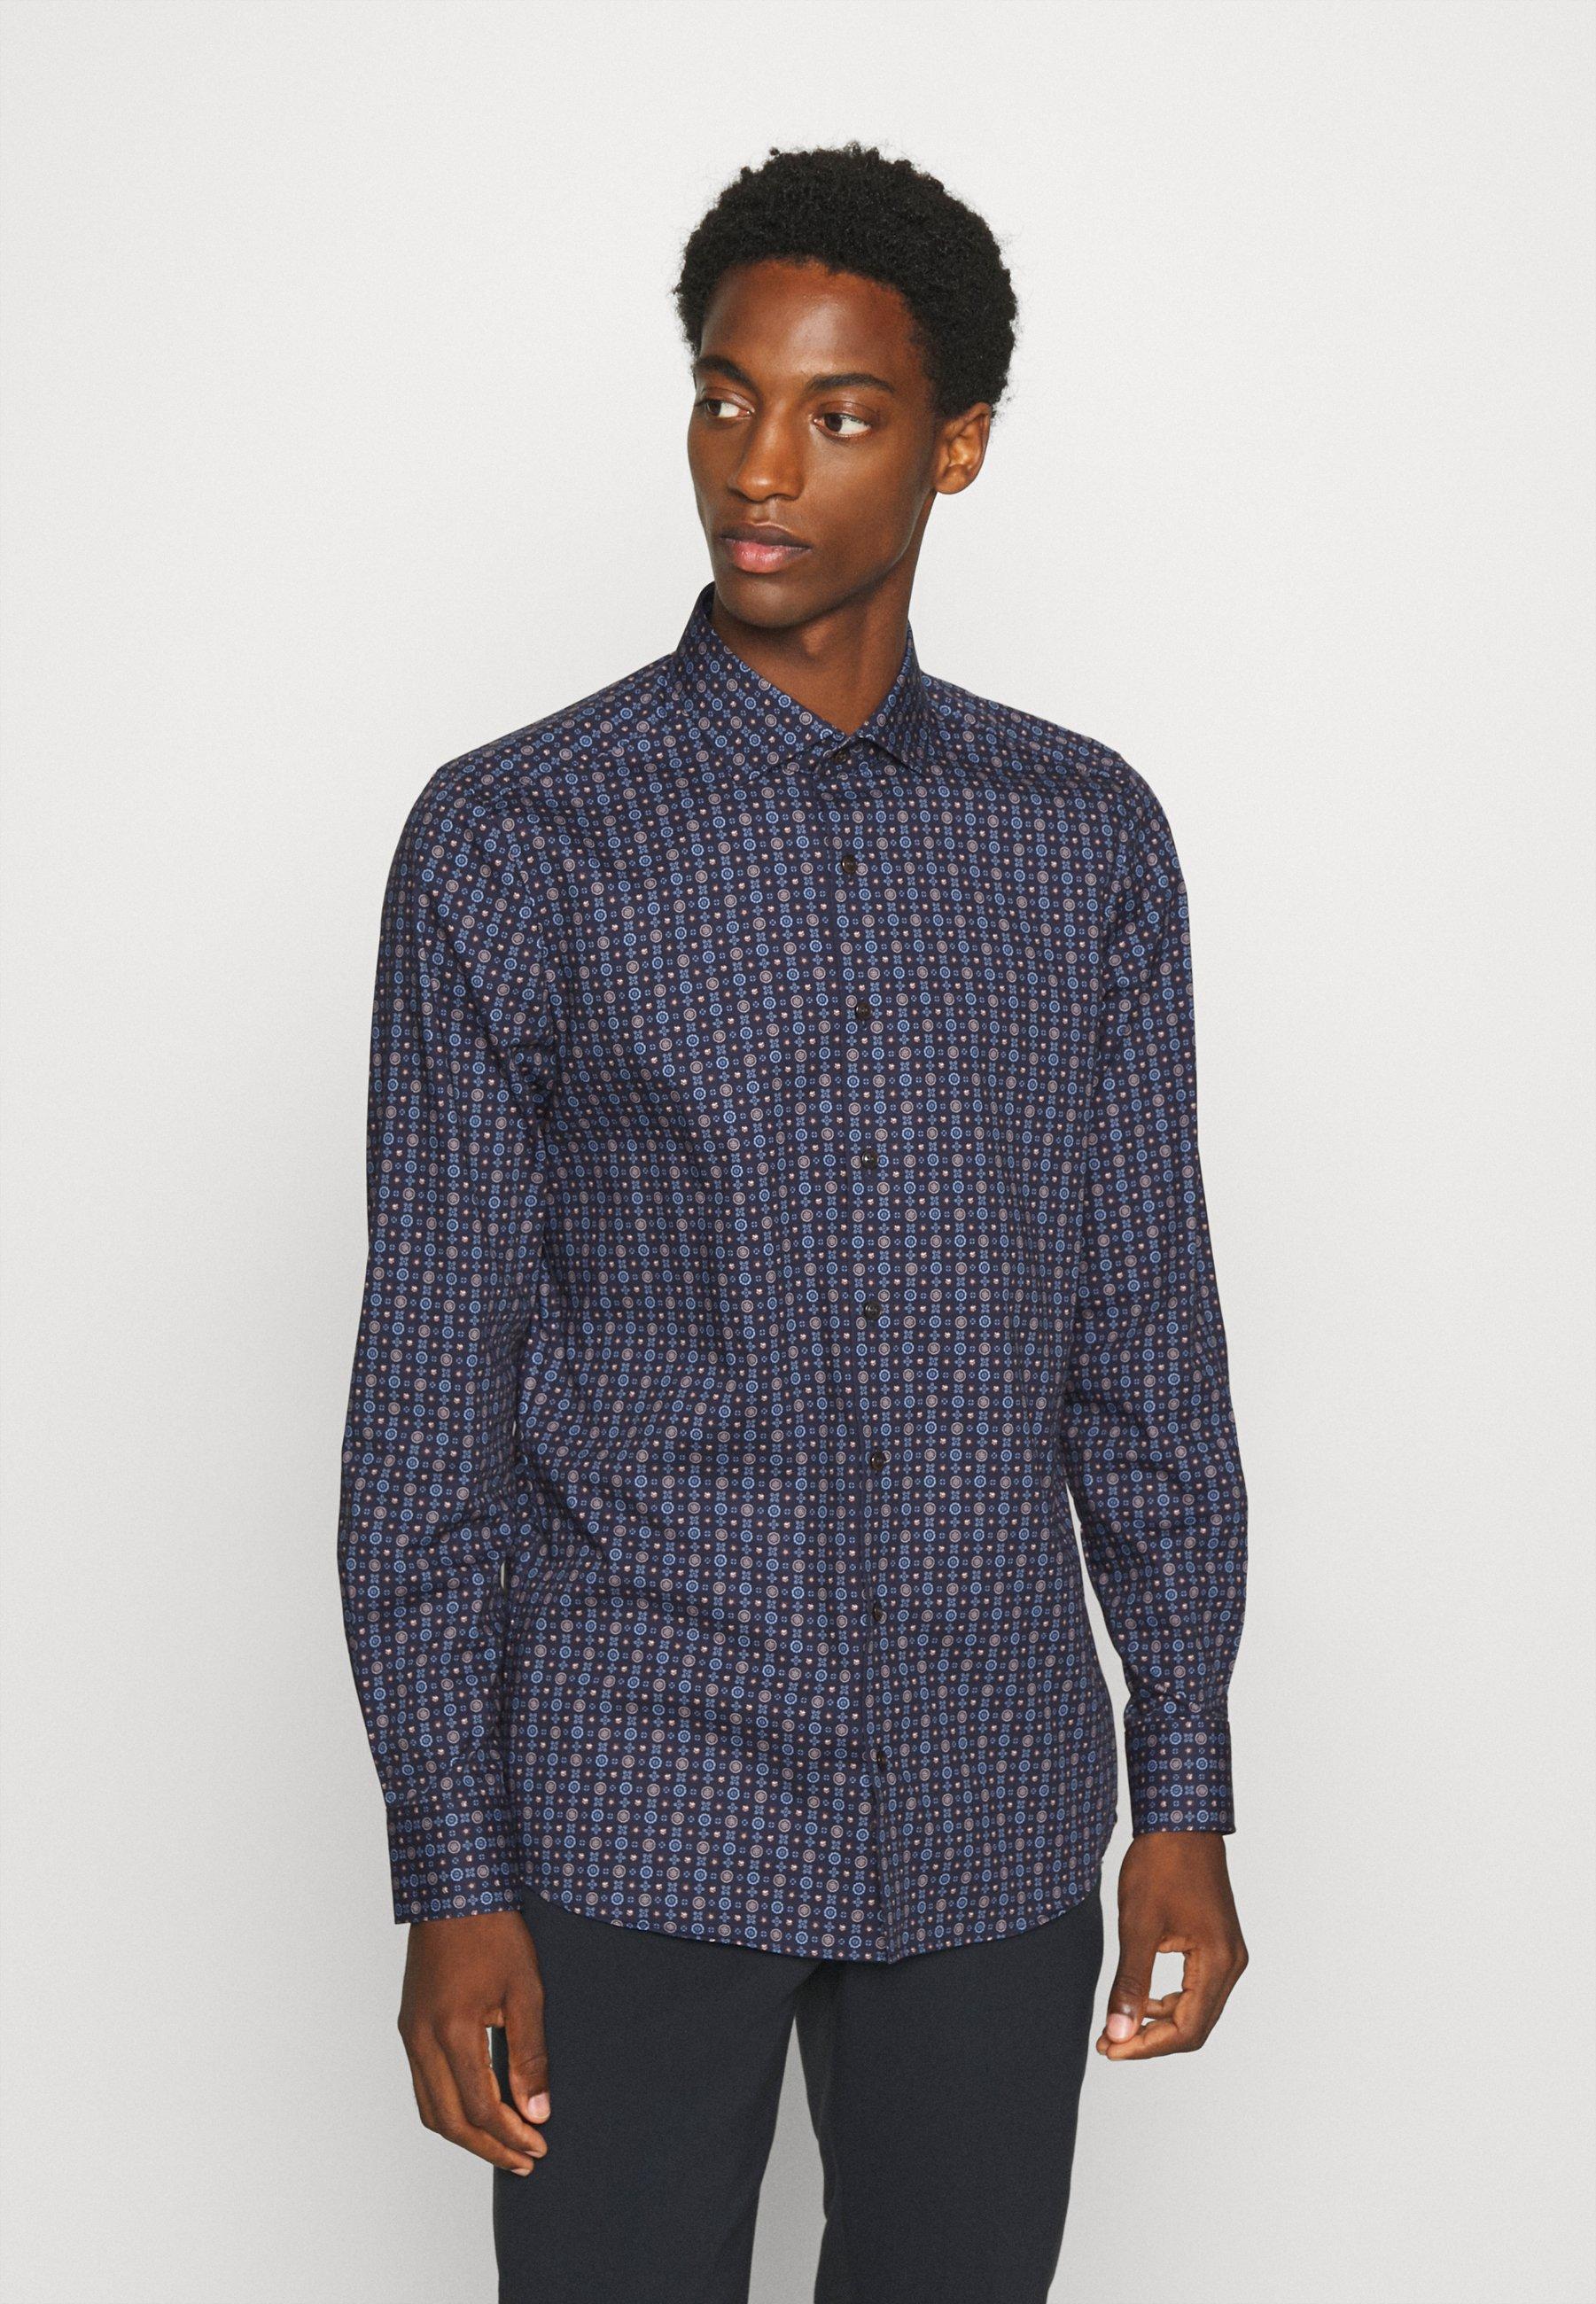 Men Level 5 - Formal shirt